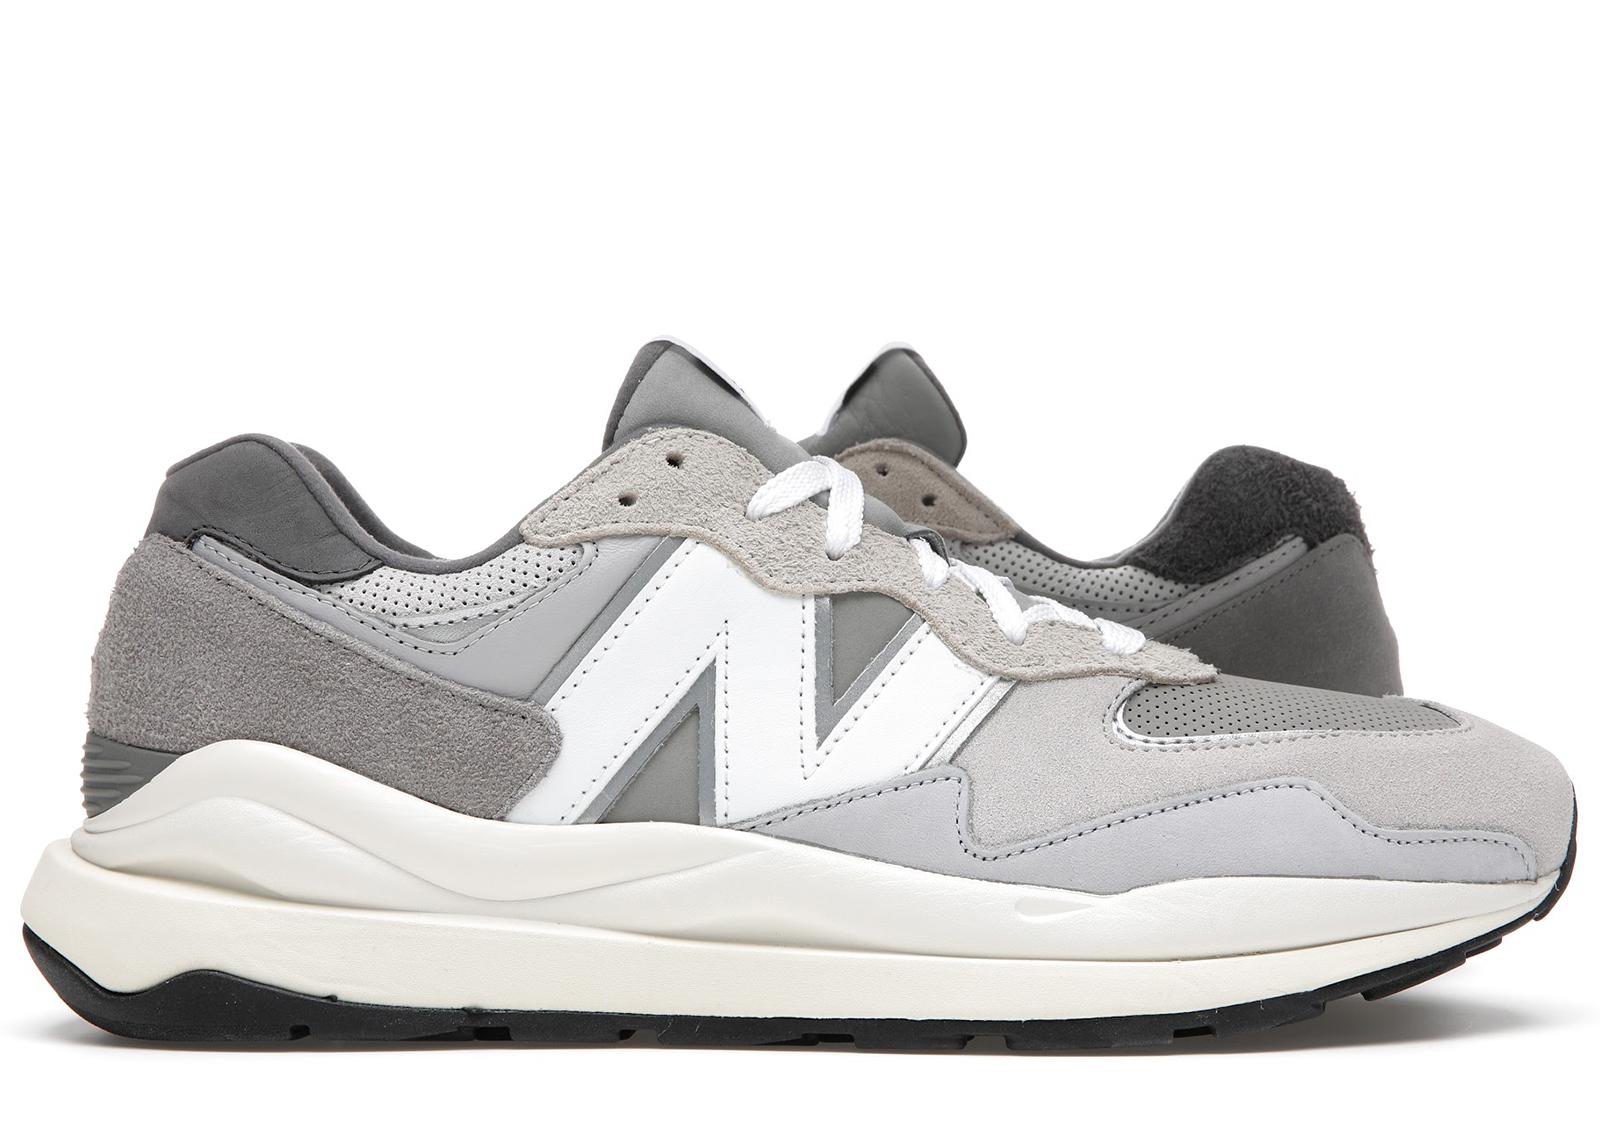 New Balance 57/40 Grey White